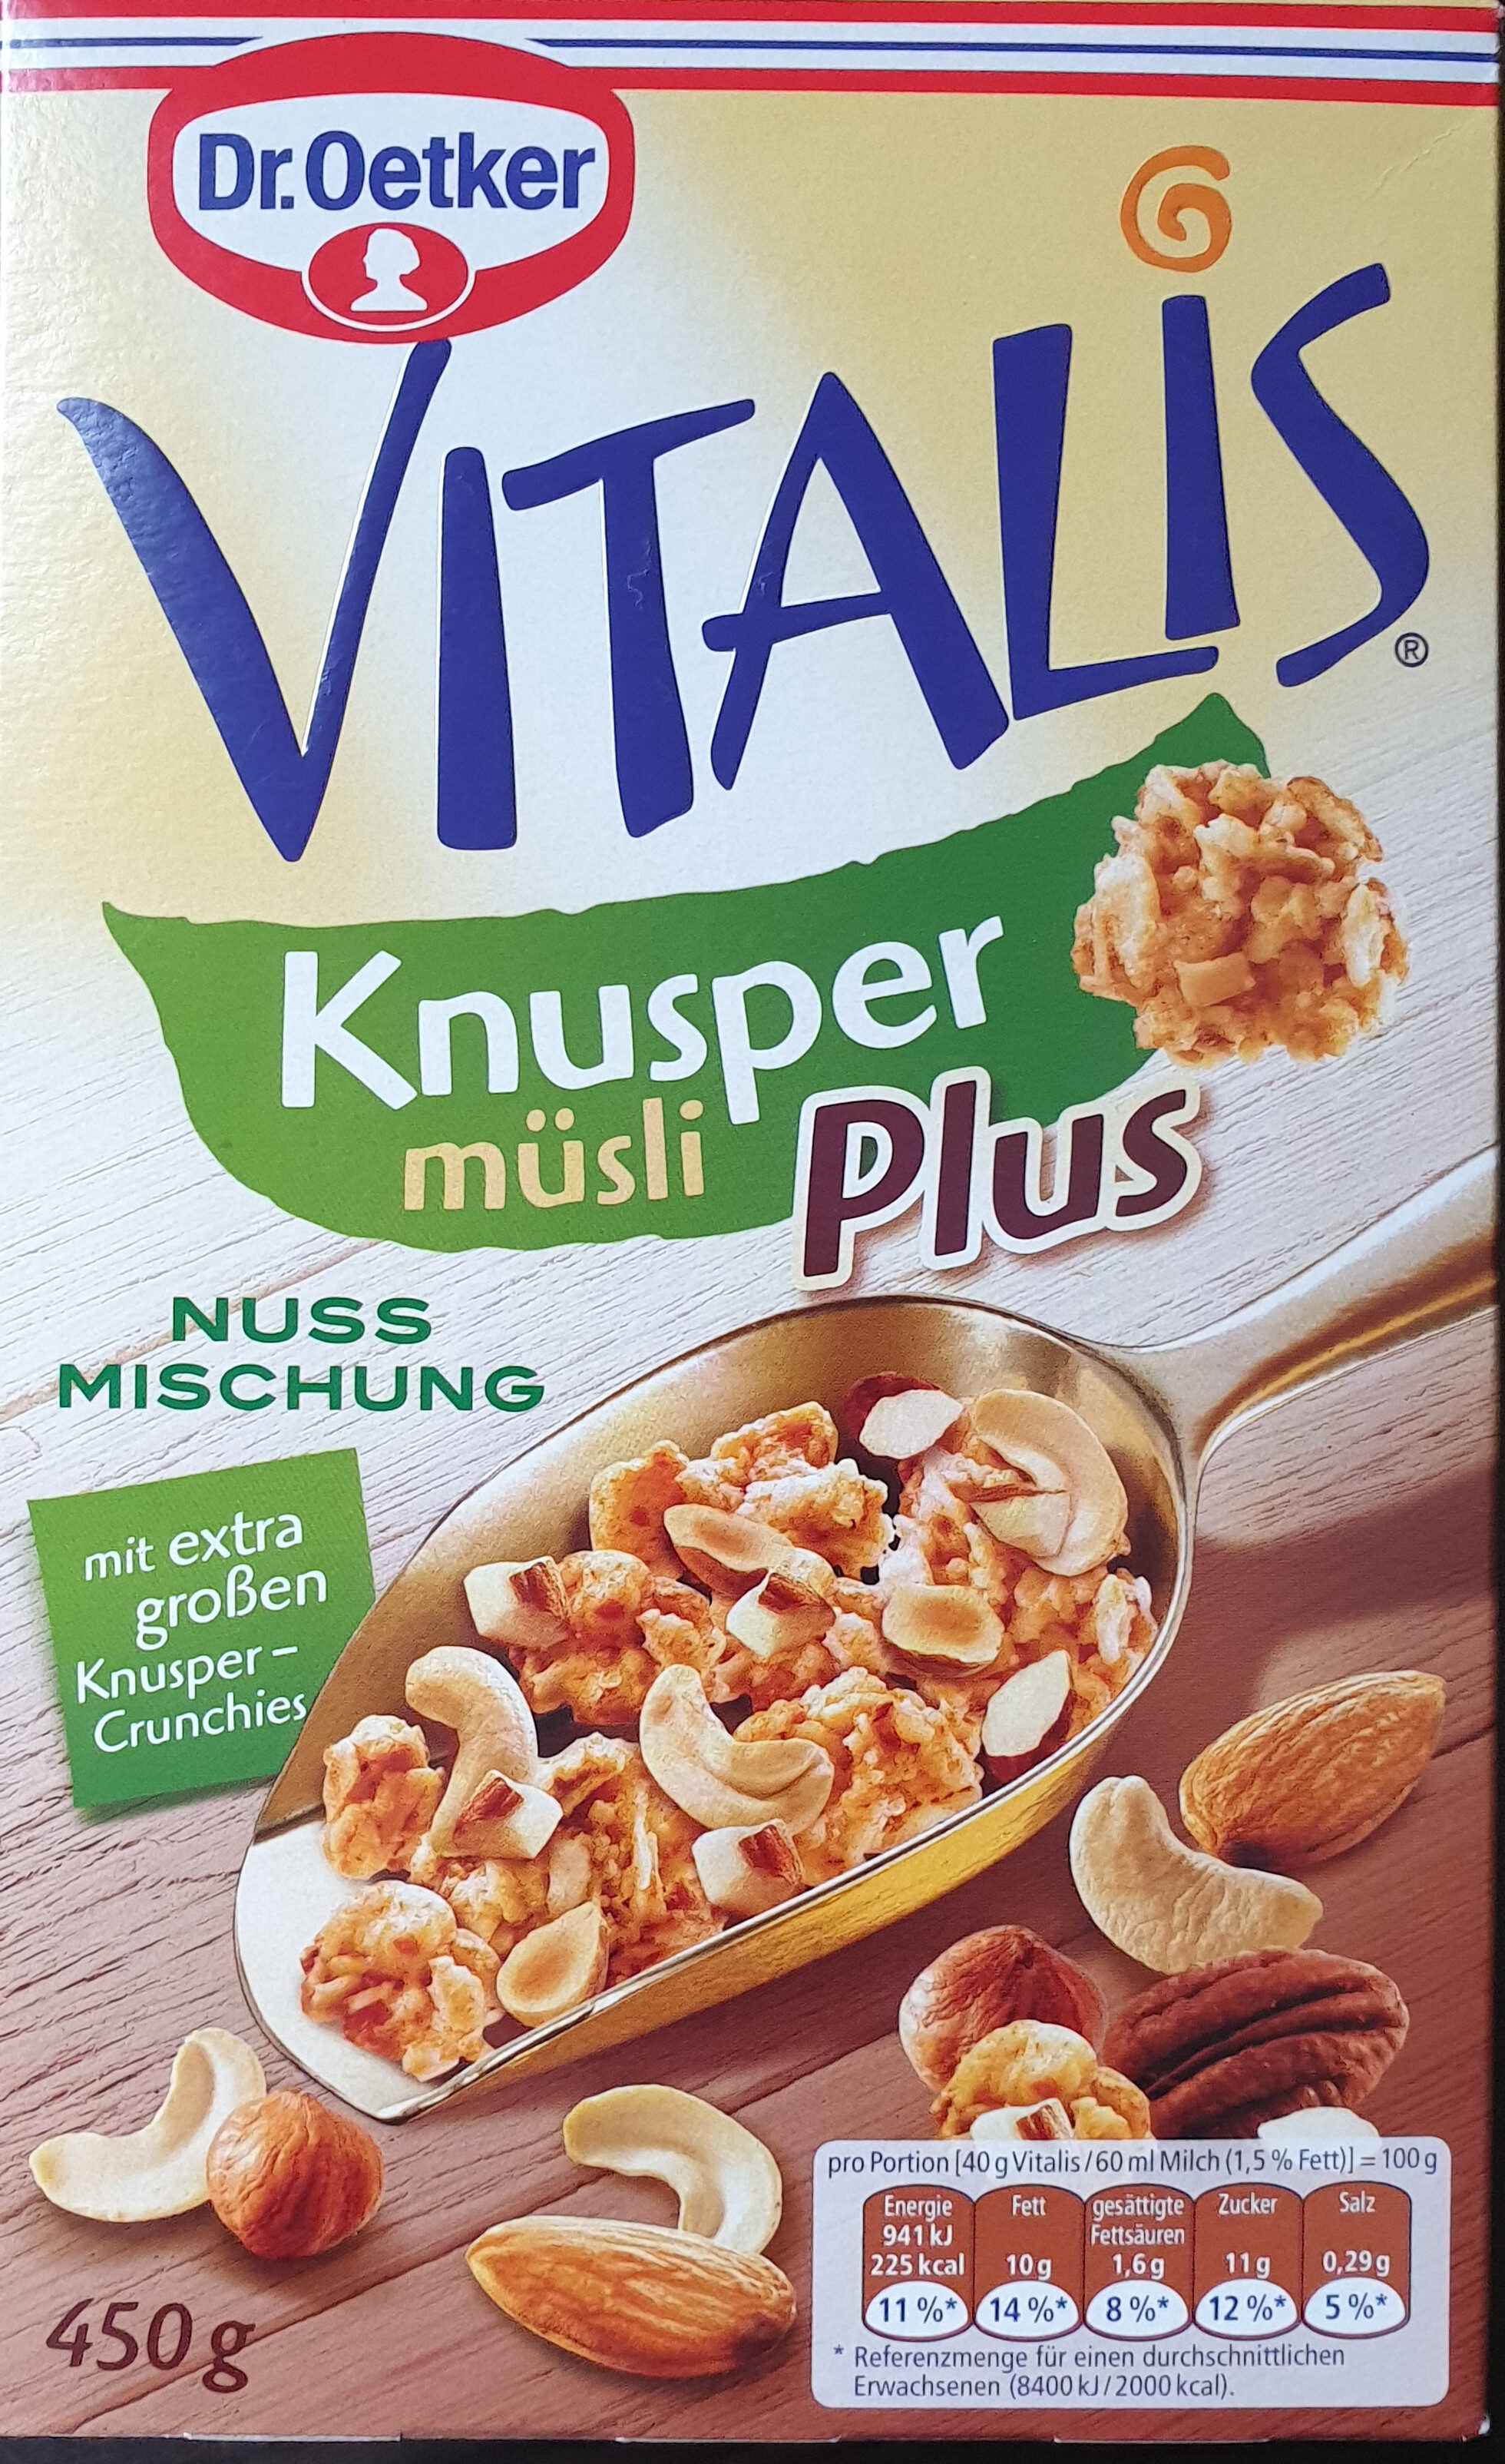 Vitalis knusper Müsli Plus - Product - de